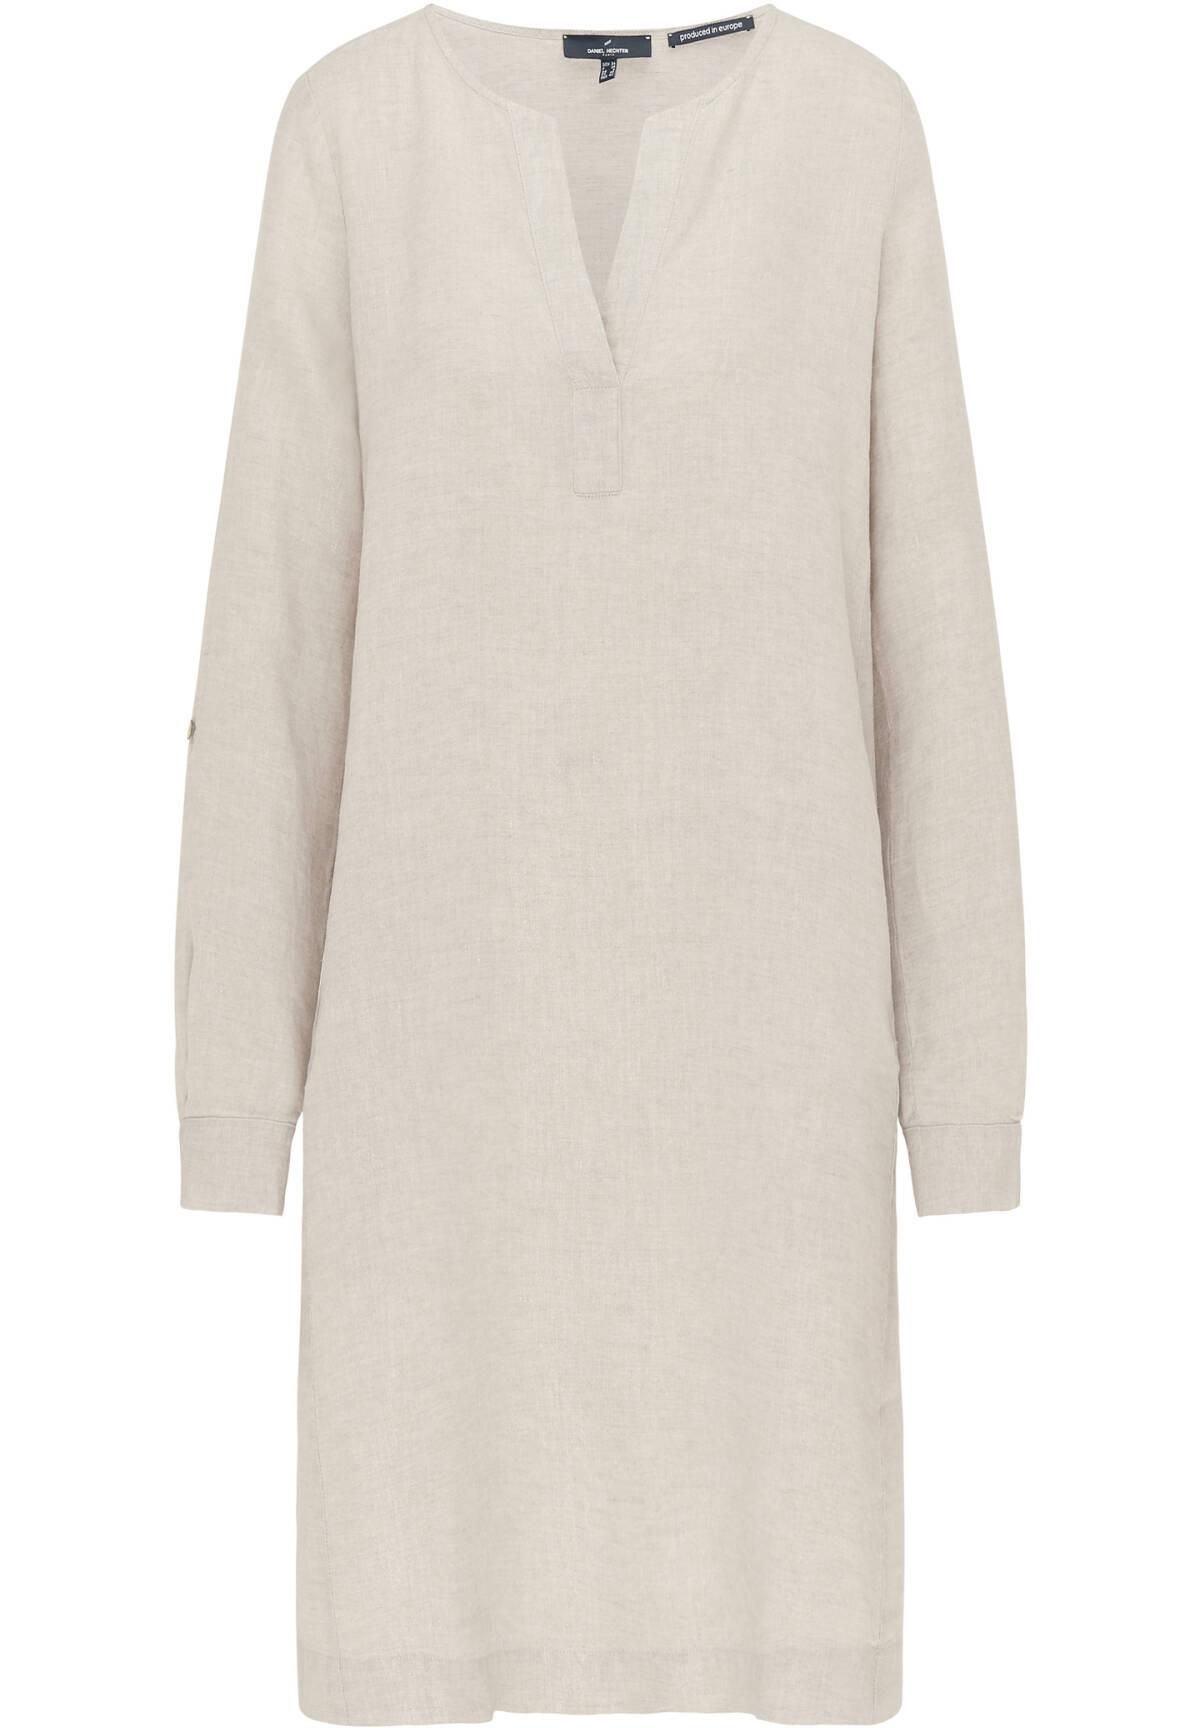 Modernes Leinen-Kleid / Dress